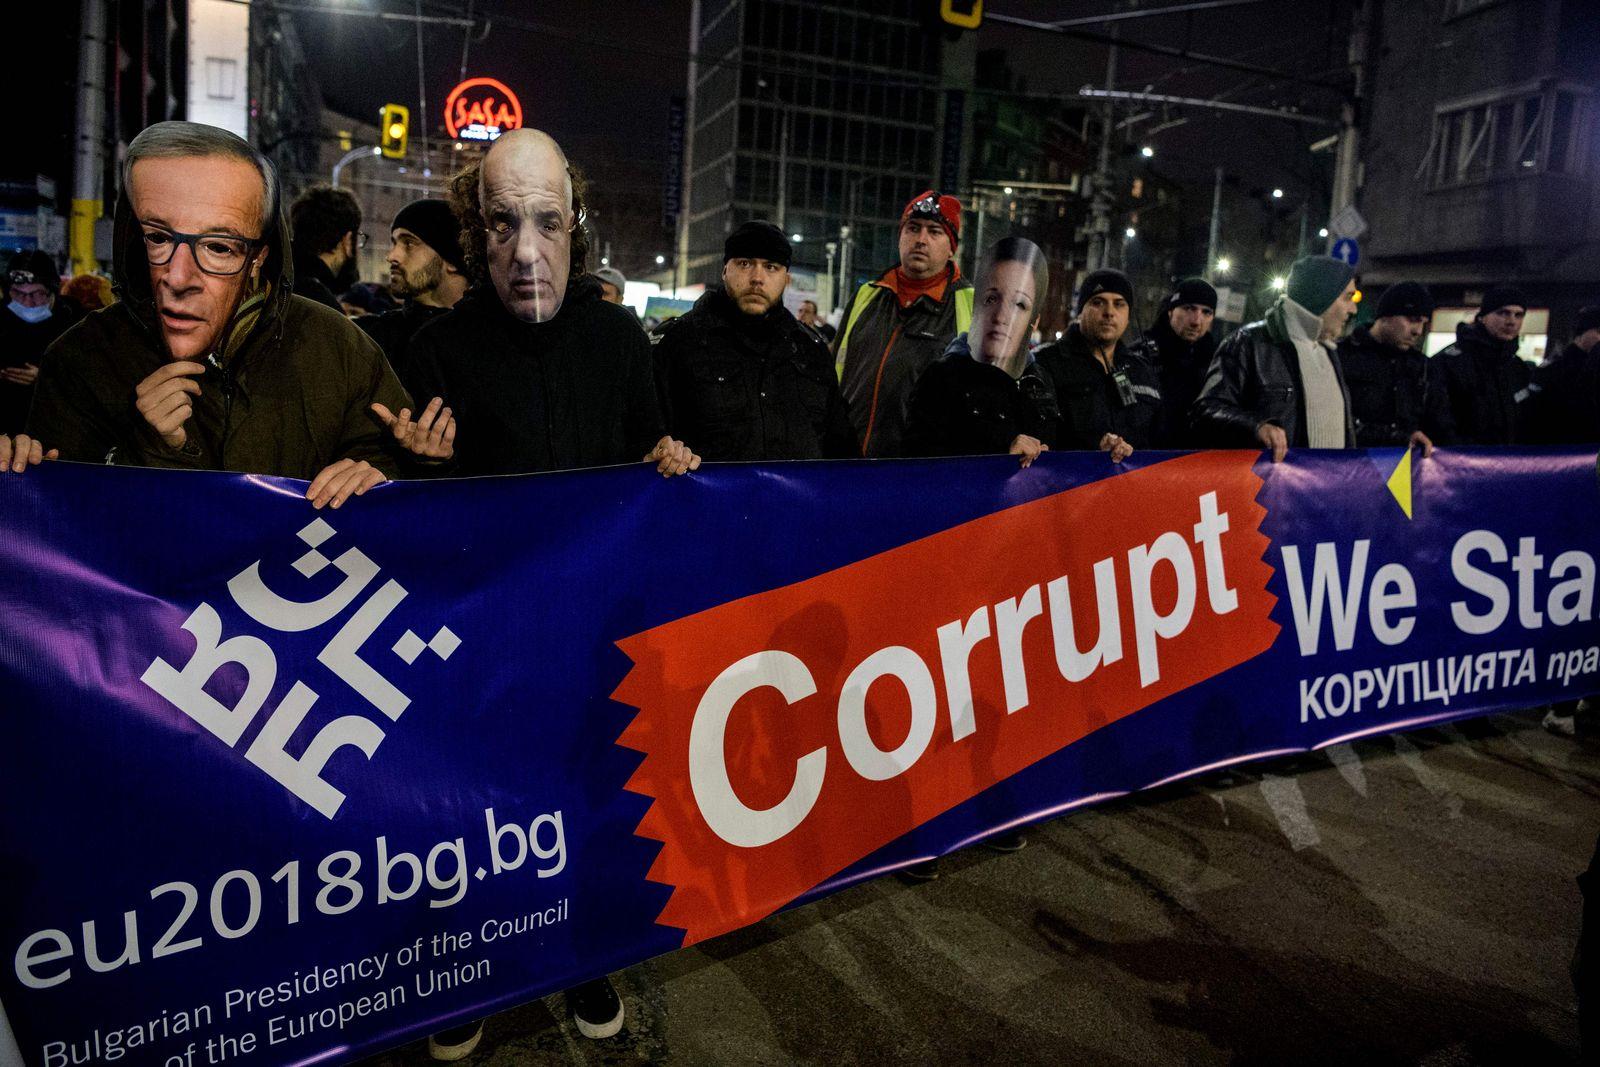 Bulgarien/ Korruption/ Demonstration/ Protest